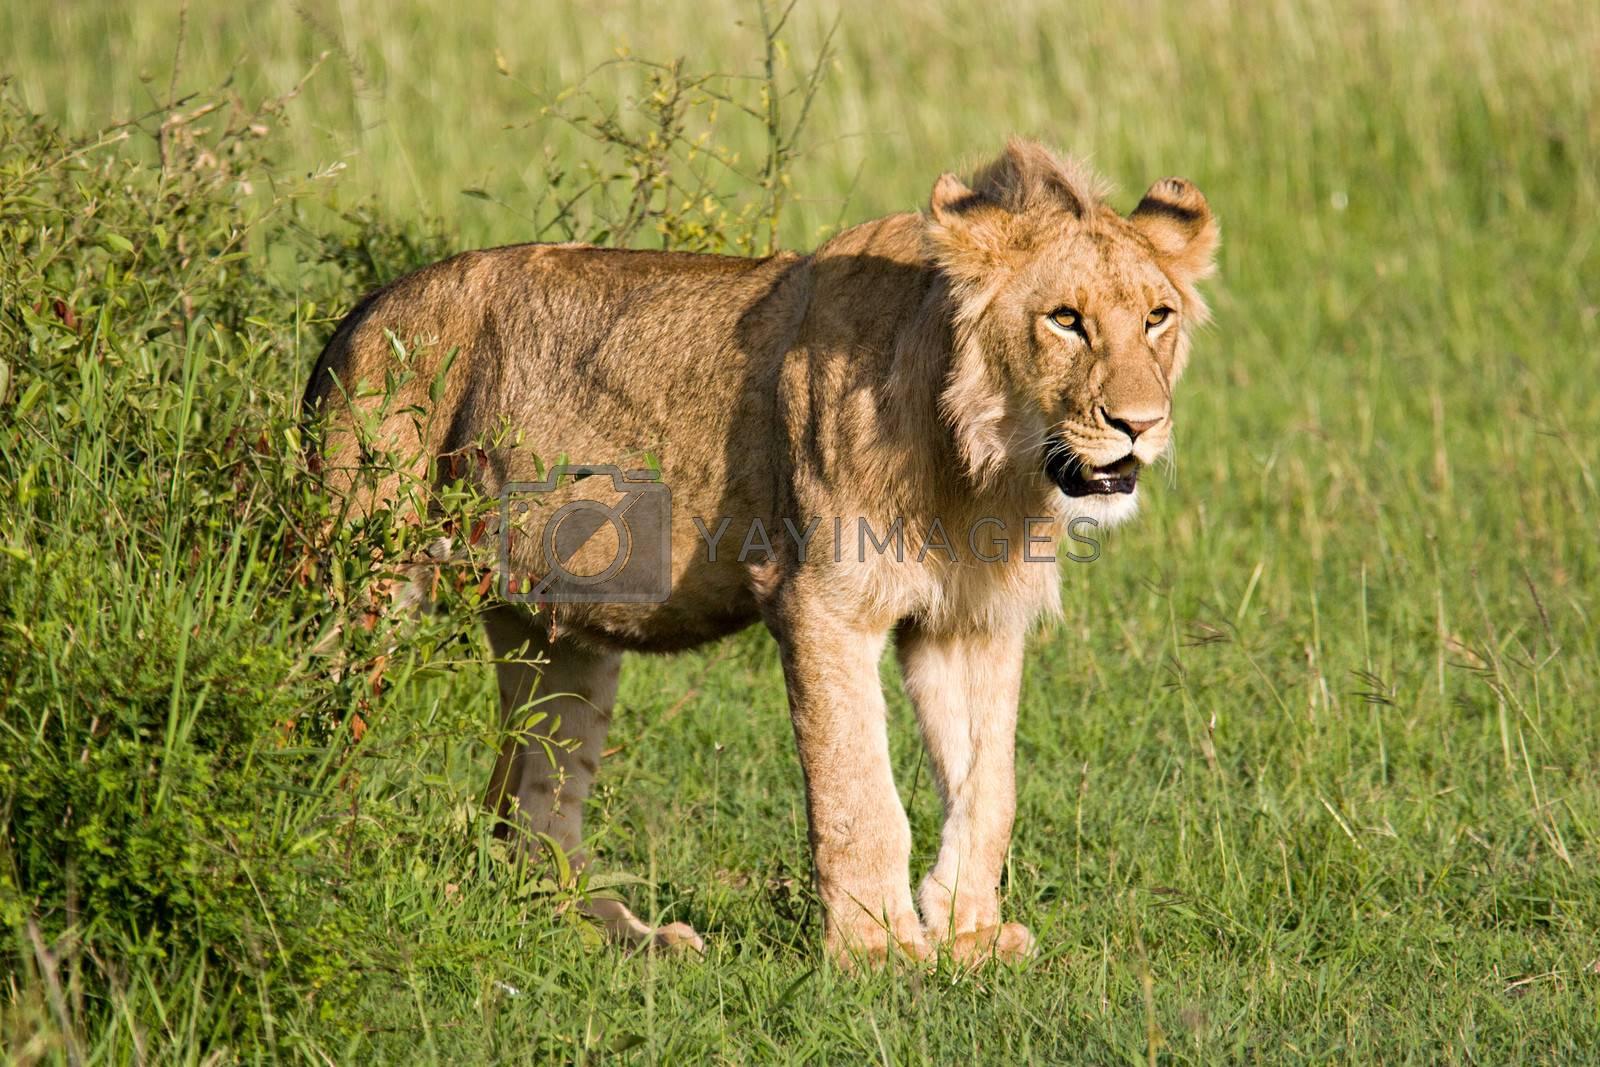 Young Lion in the Savannah in Massai Mara, Kenya.